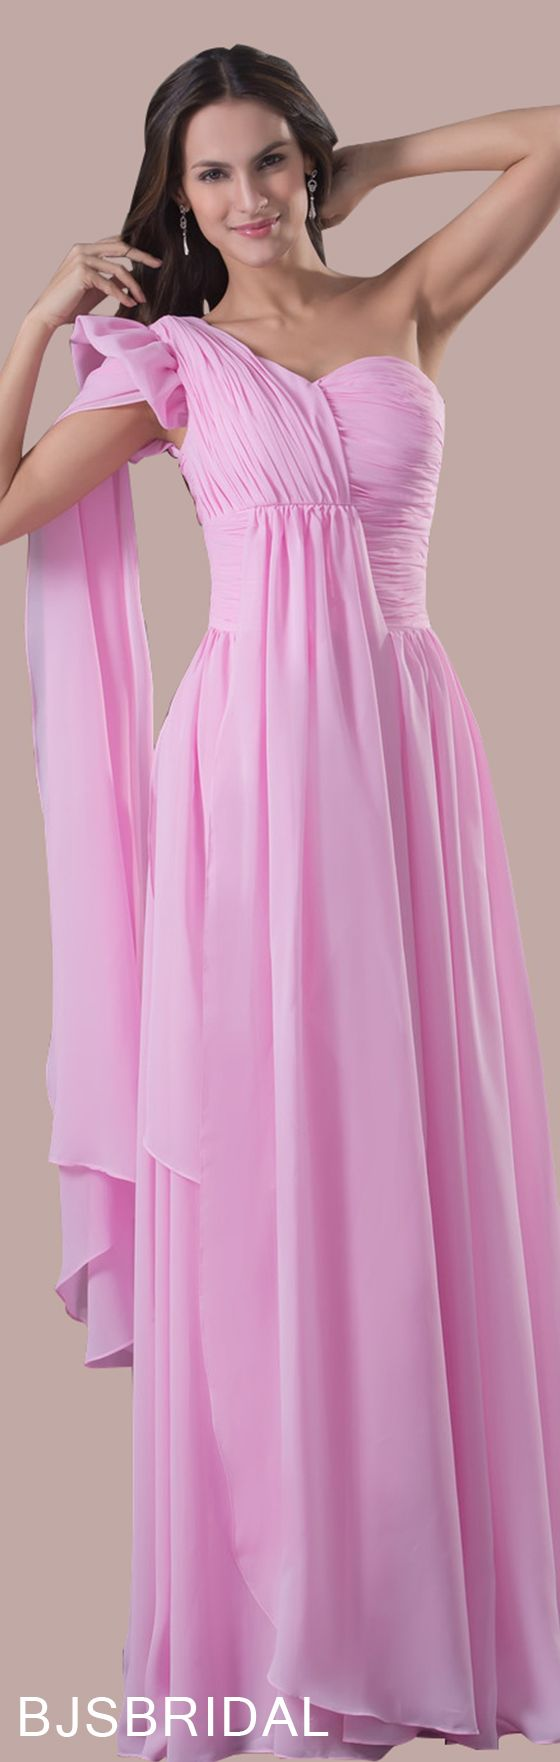 f6d69f26ac4 Baby Pink Elegant A-line Asymmetric Neckline Sleeveless Zipper Ruching  Bridesmaid Dress